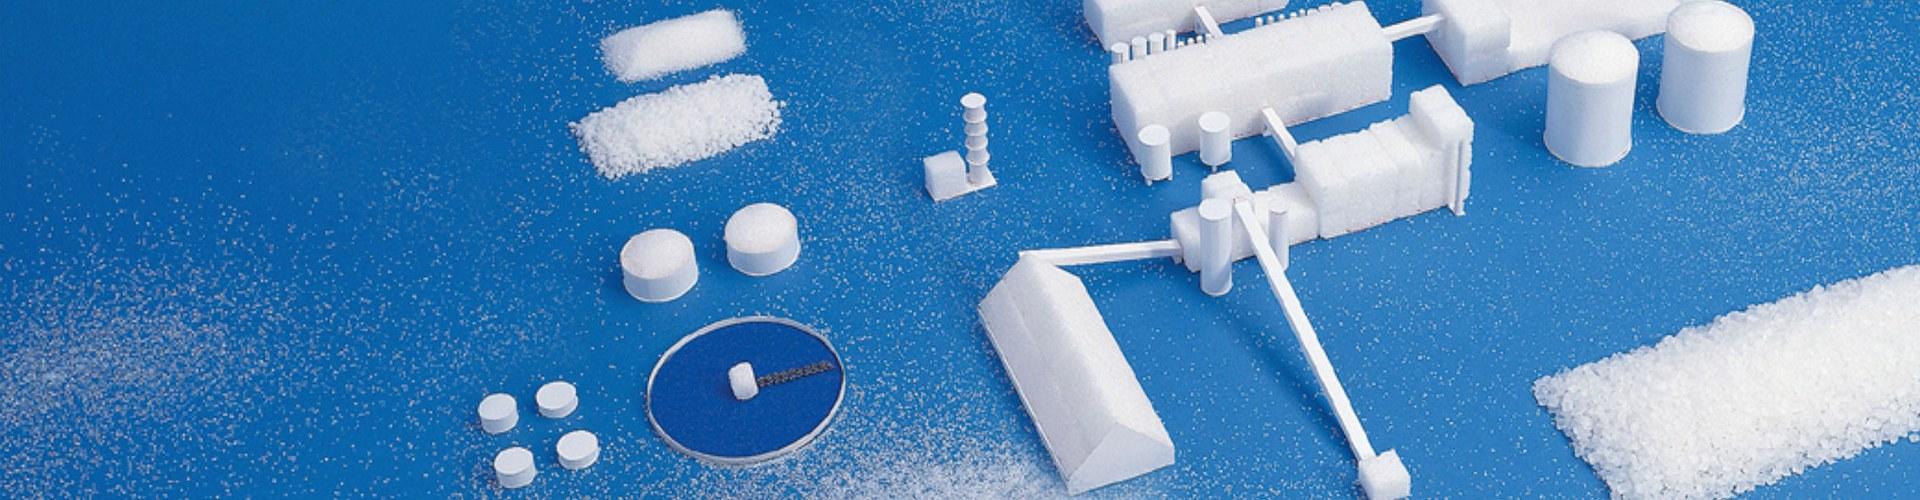 Ingenieurbüro Planungsbüro Zucker Zuckerfabrik